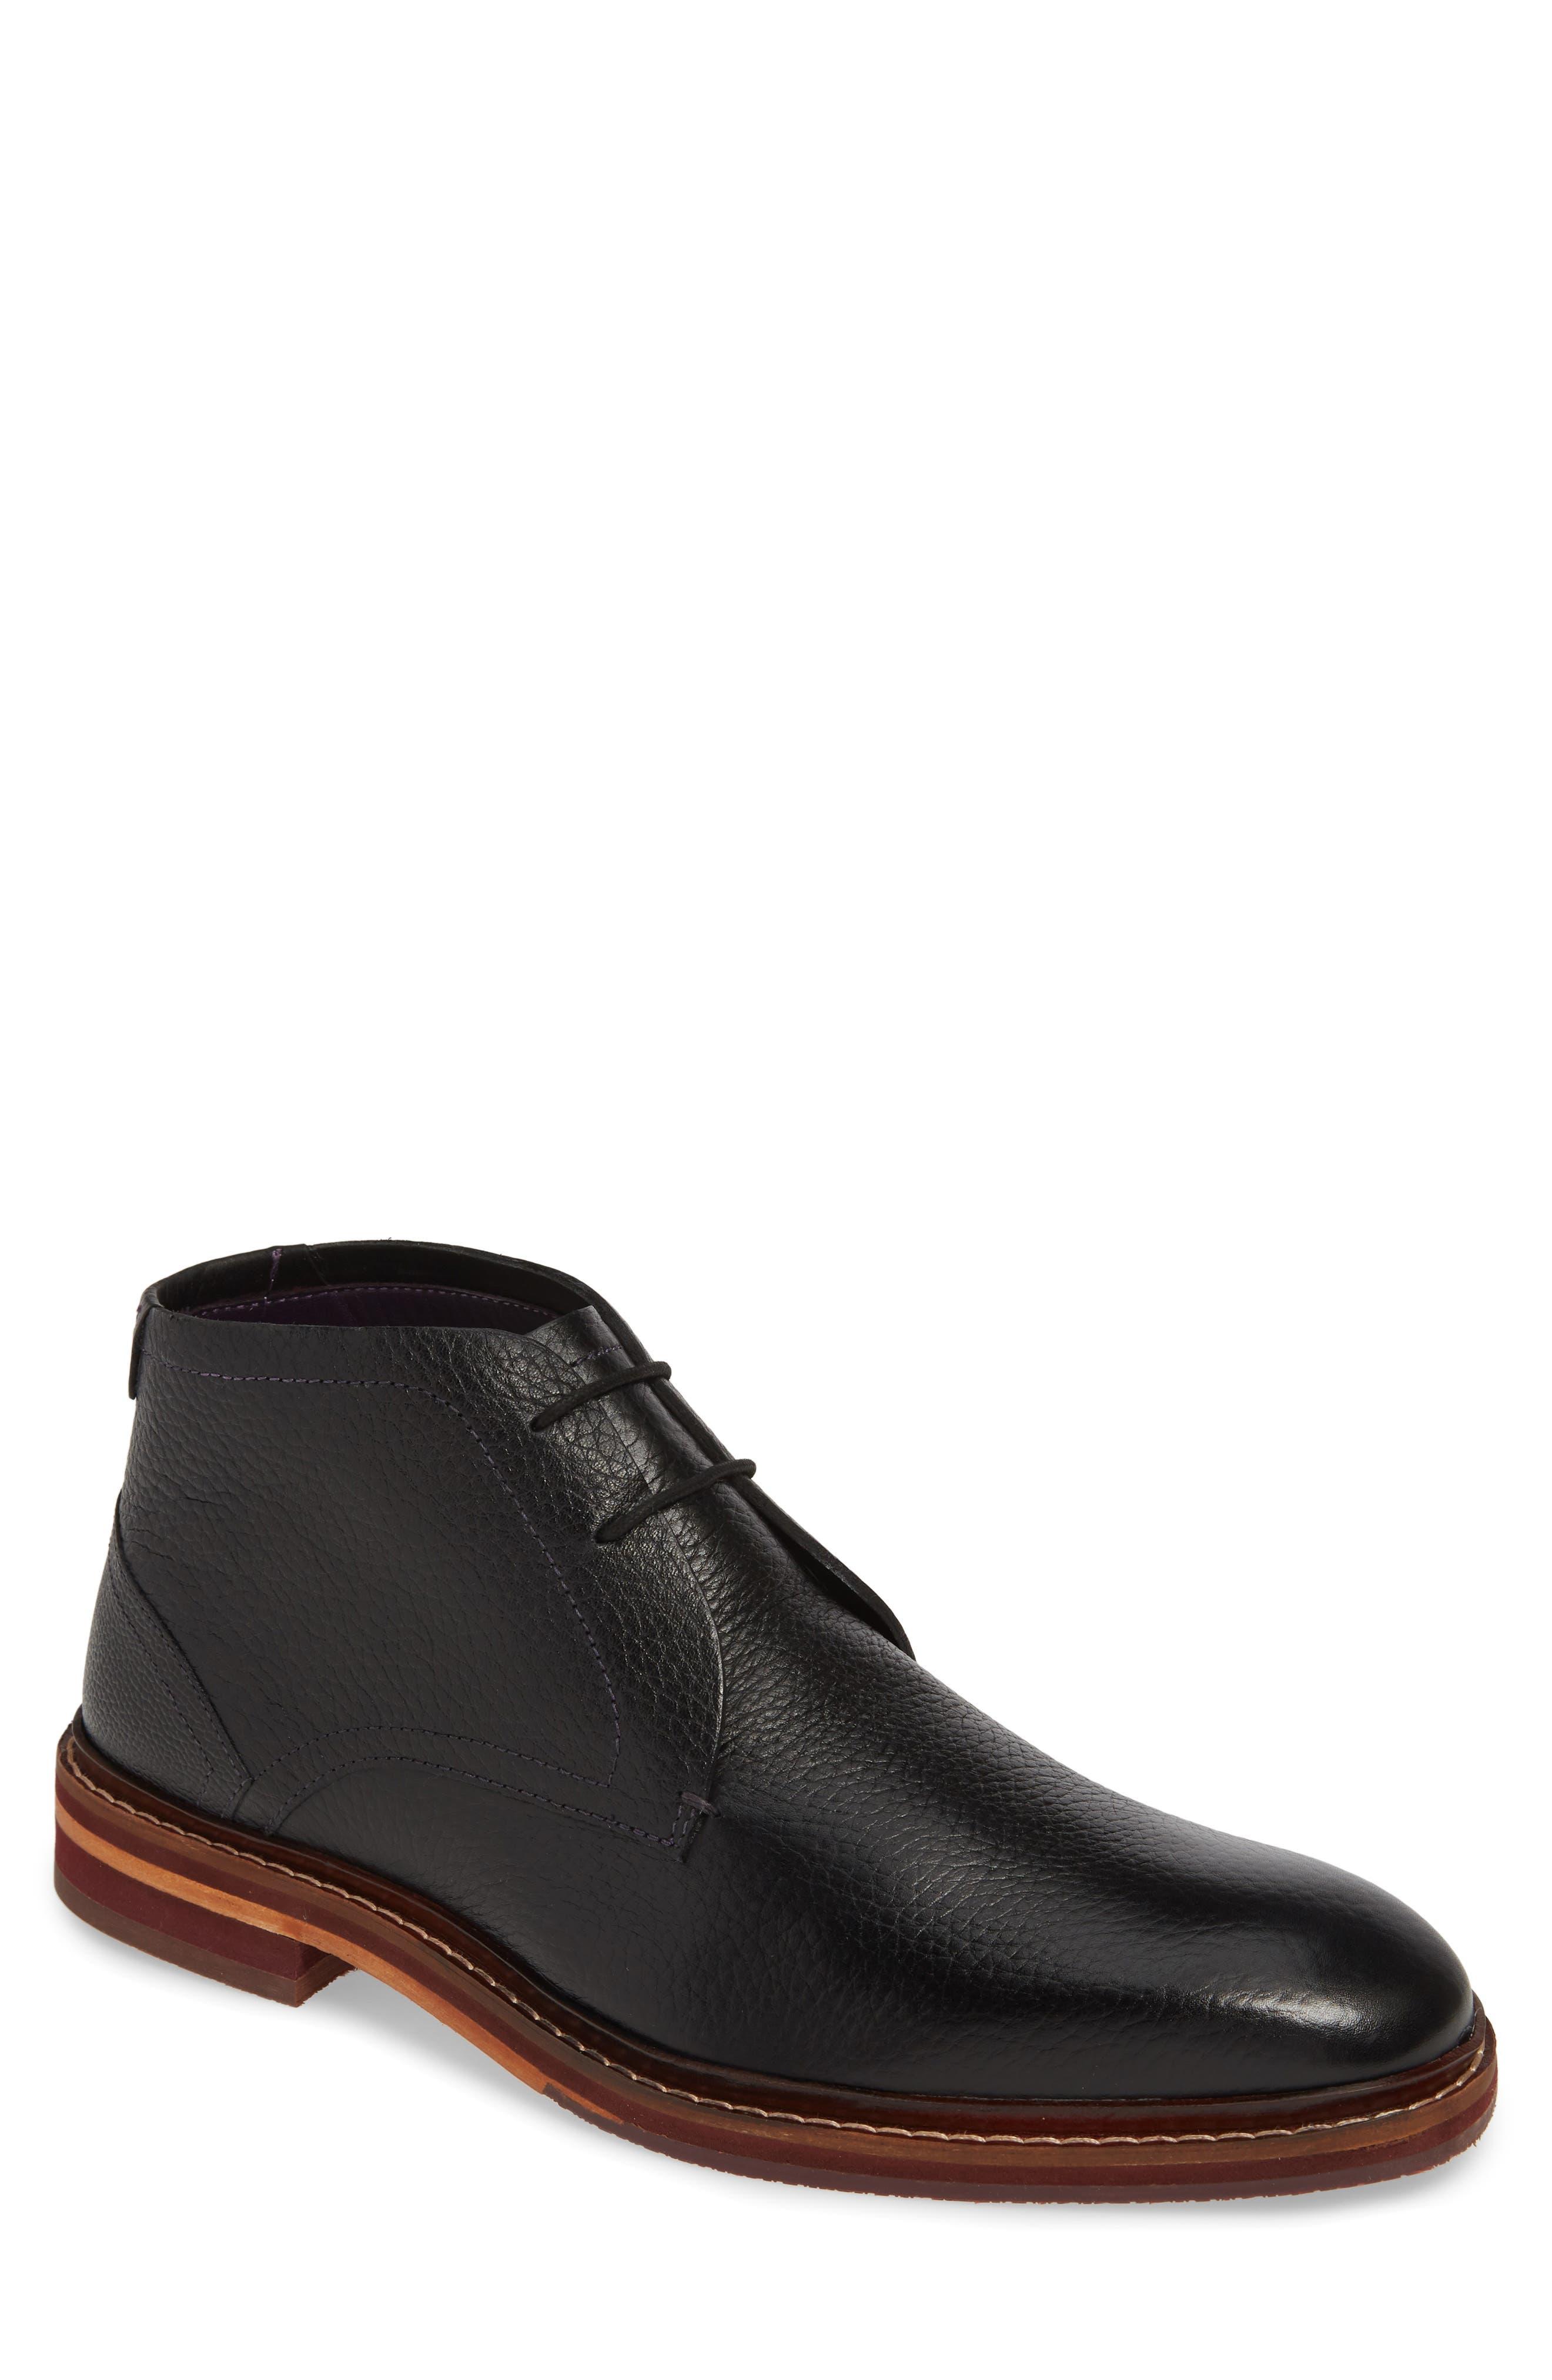 52a3cdd30 Ted Baker London Corans Chukka Boot